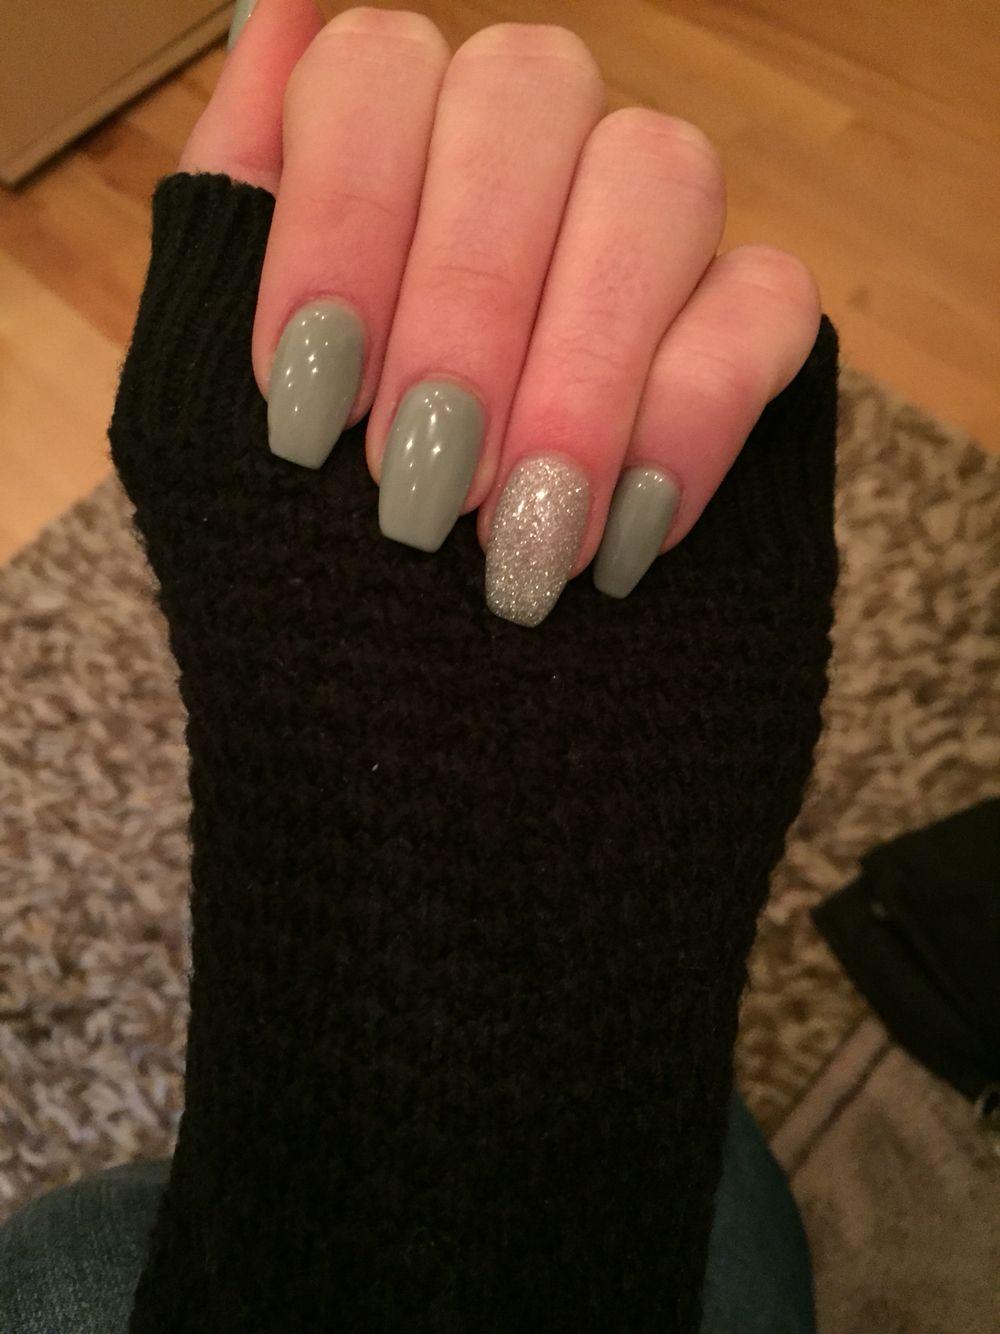 grau#glitzer#gel#nägel#eckig | Nägel | Pinterest | Gel-Nägel ...